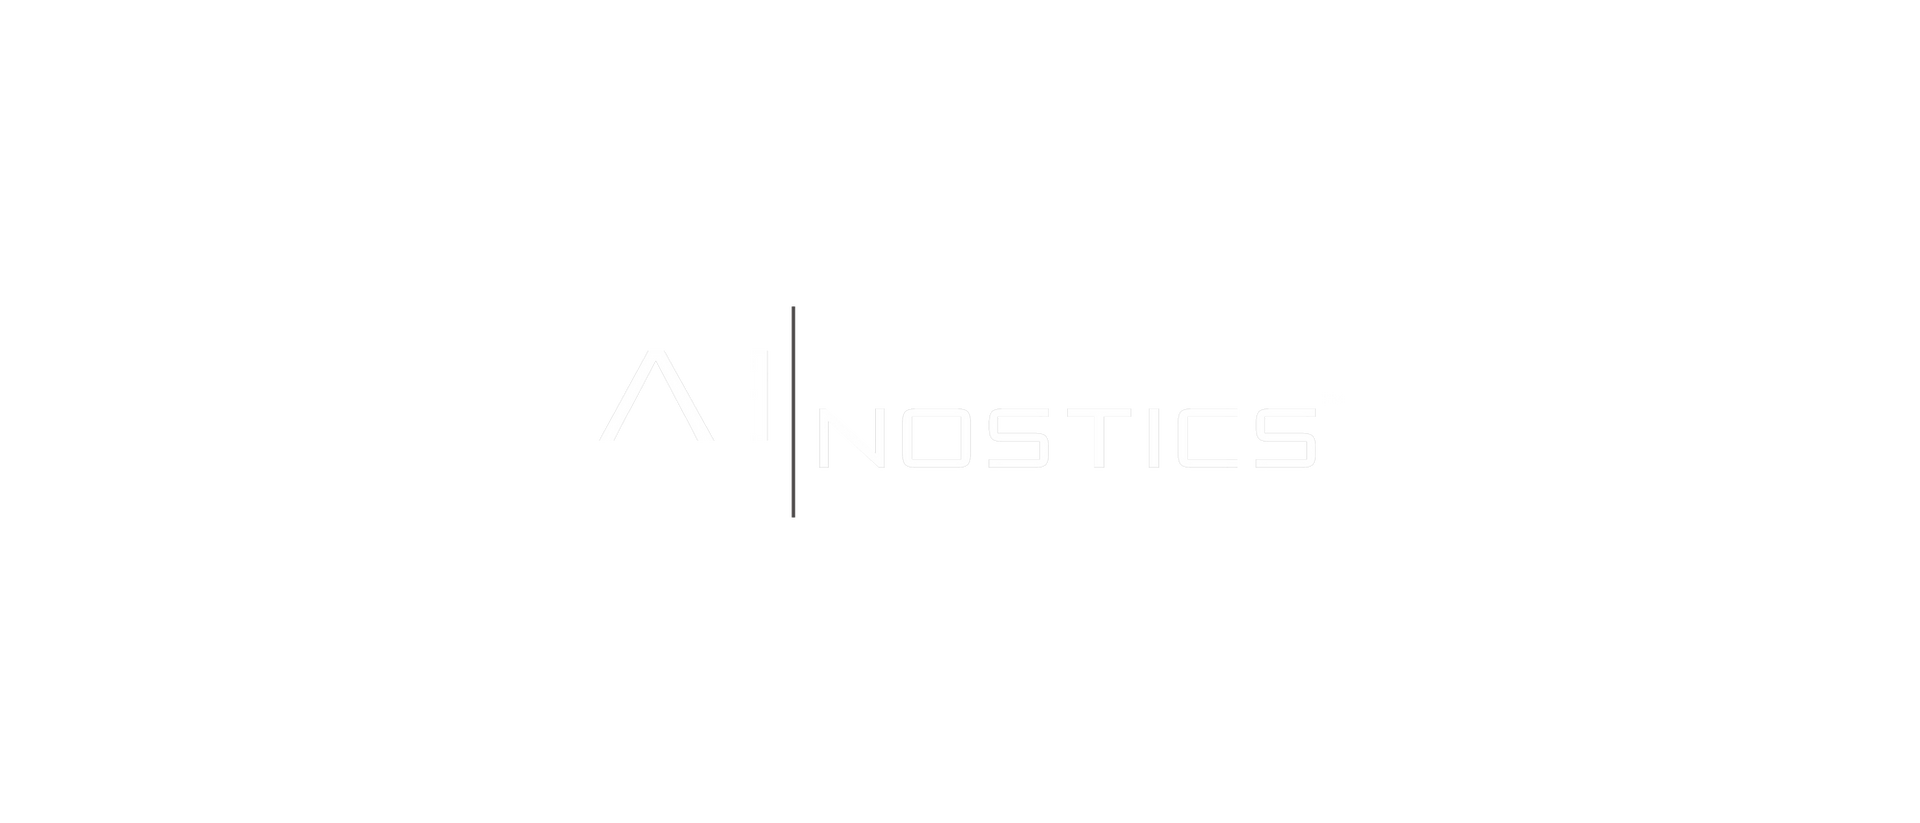 AINOSTICS_LOGO